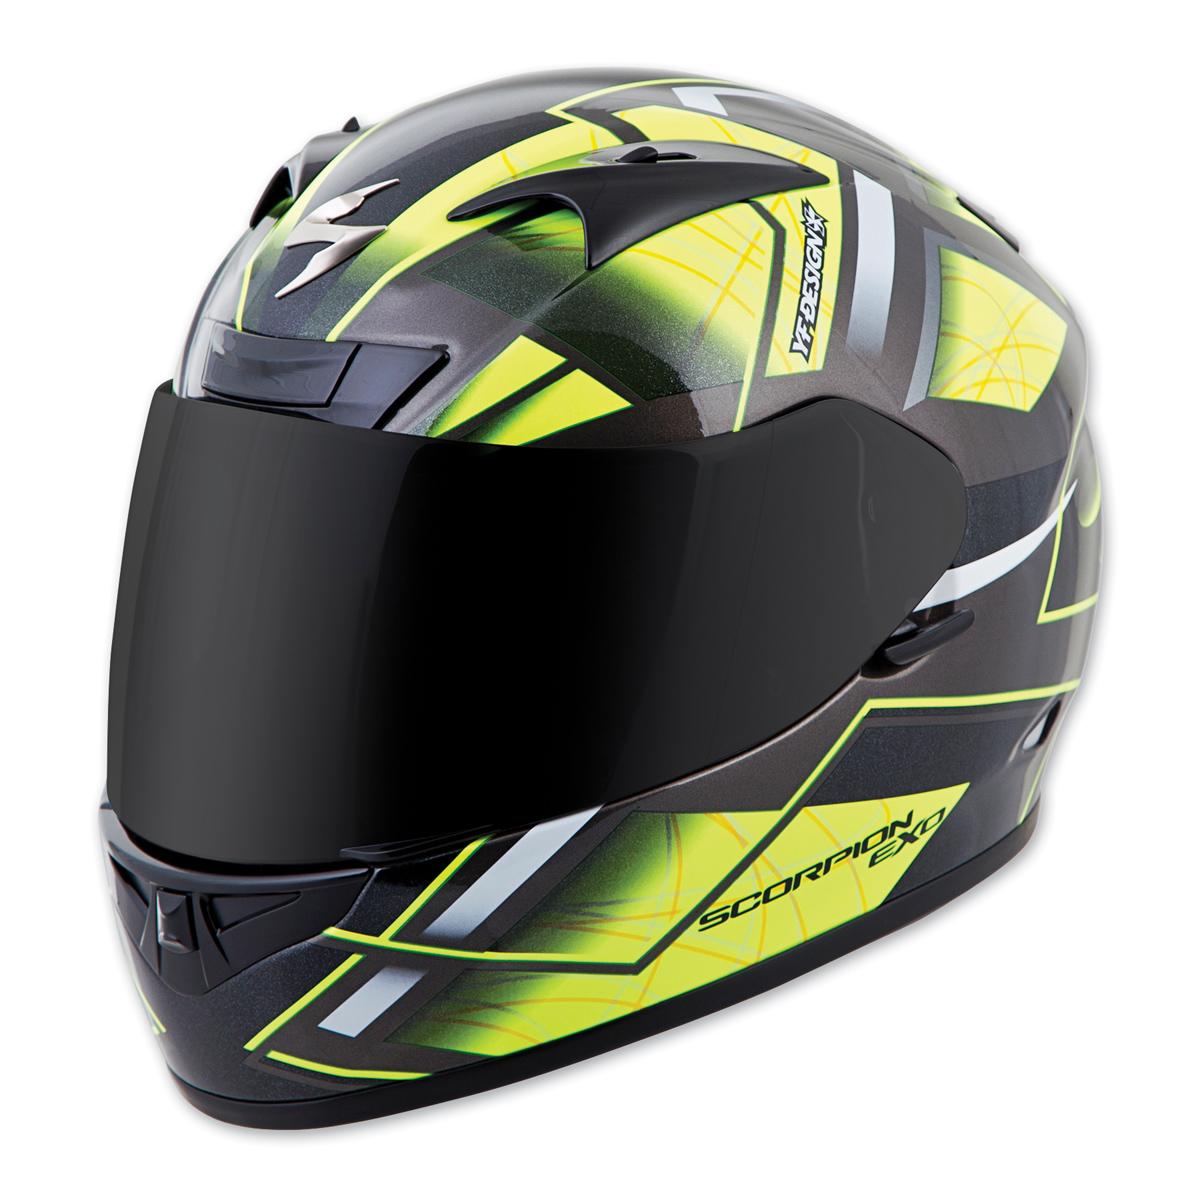 Scorpion EXO EXO-R710 Fuji Neon Full Face Helmet